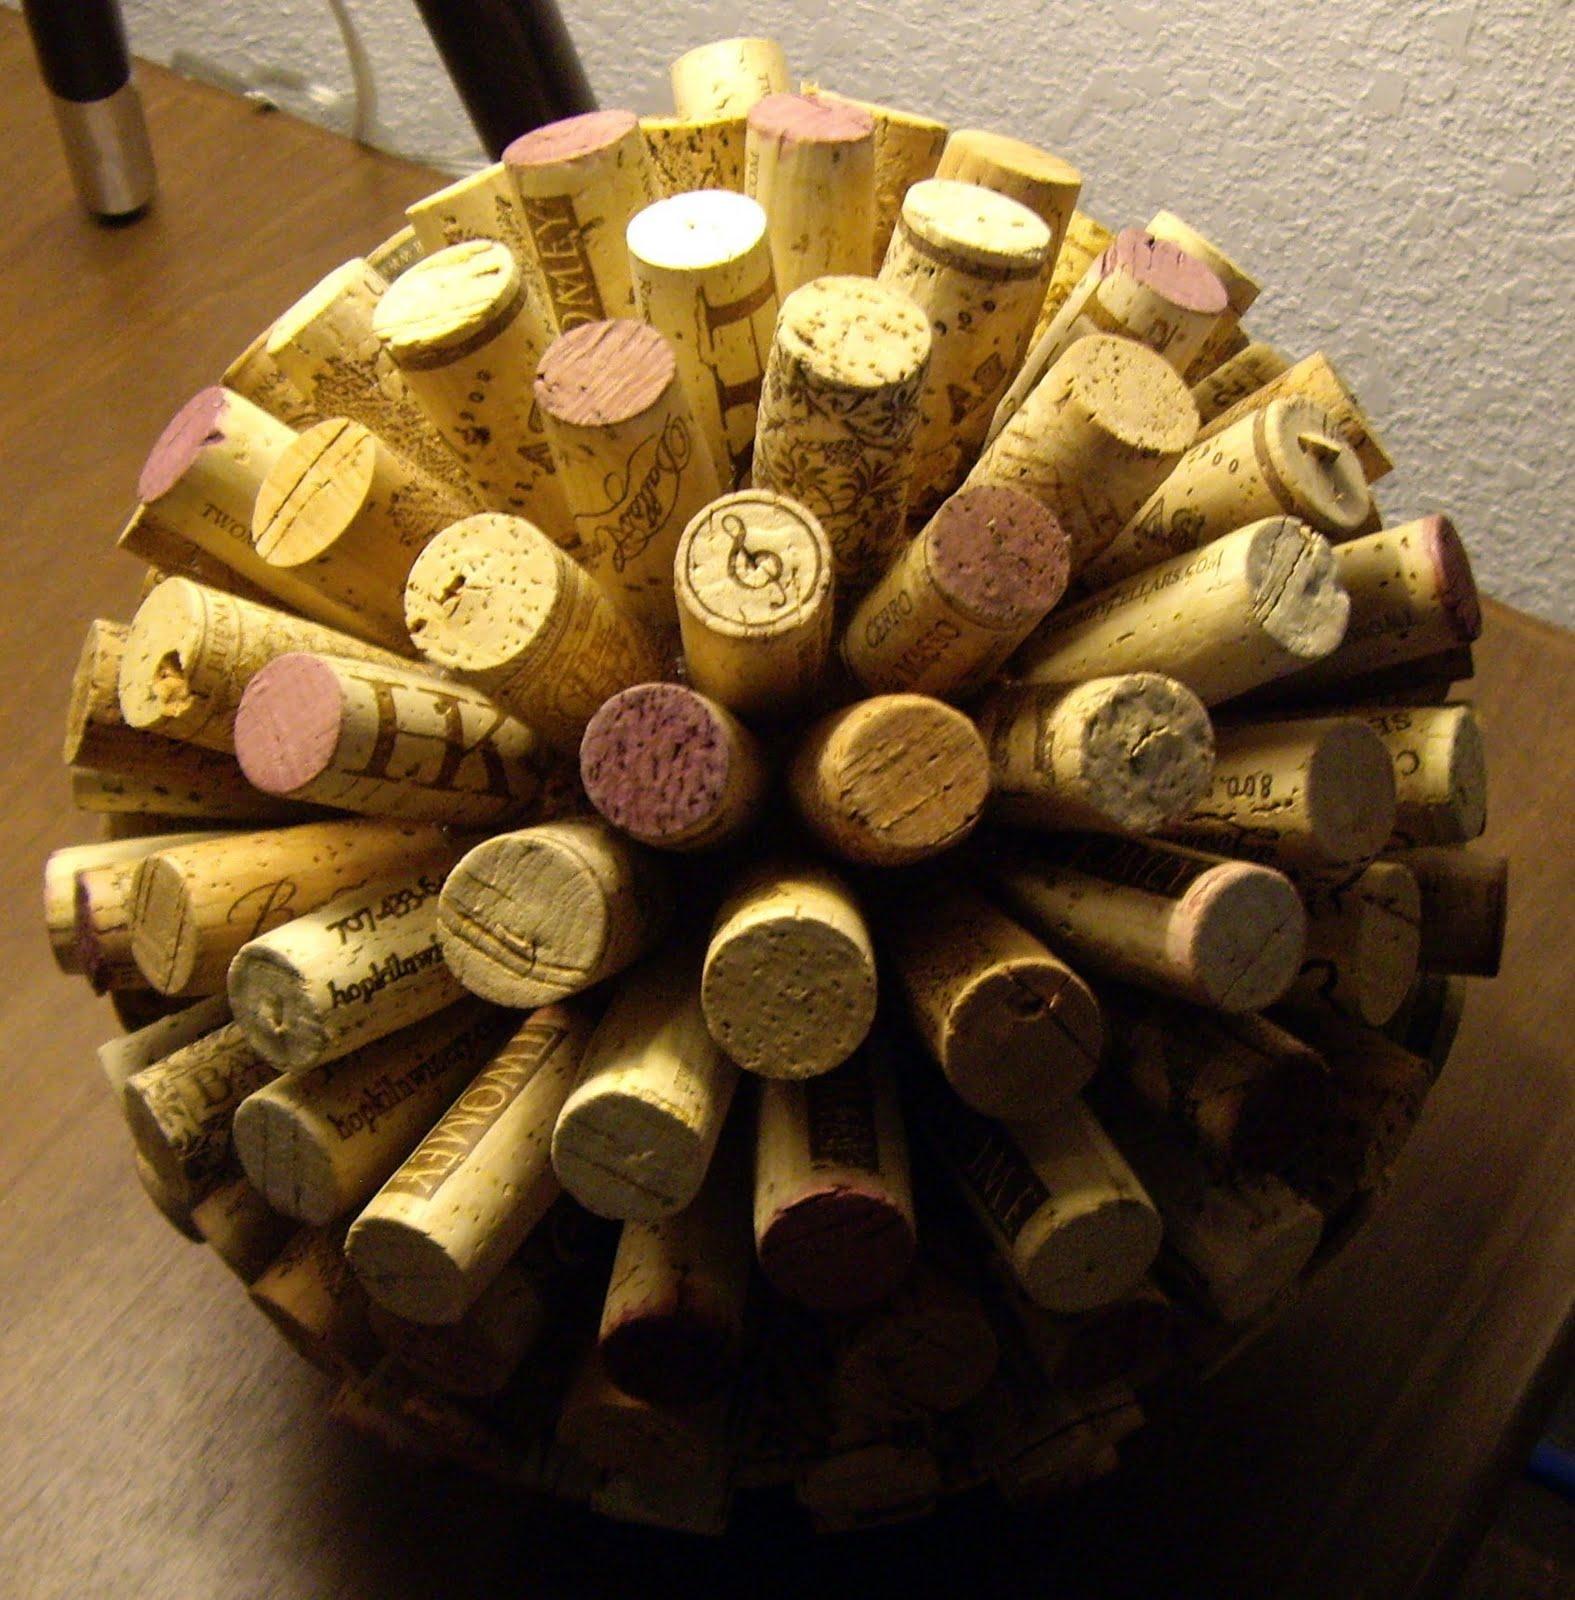 15 Ways To Reuse Corks Part 2